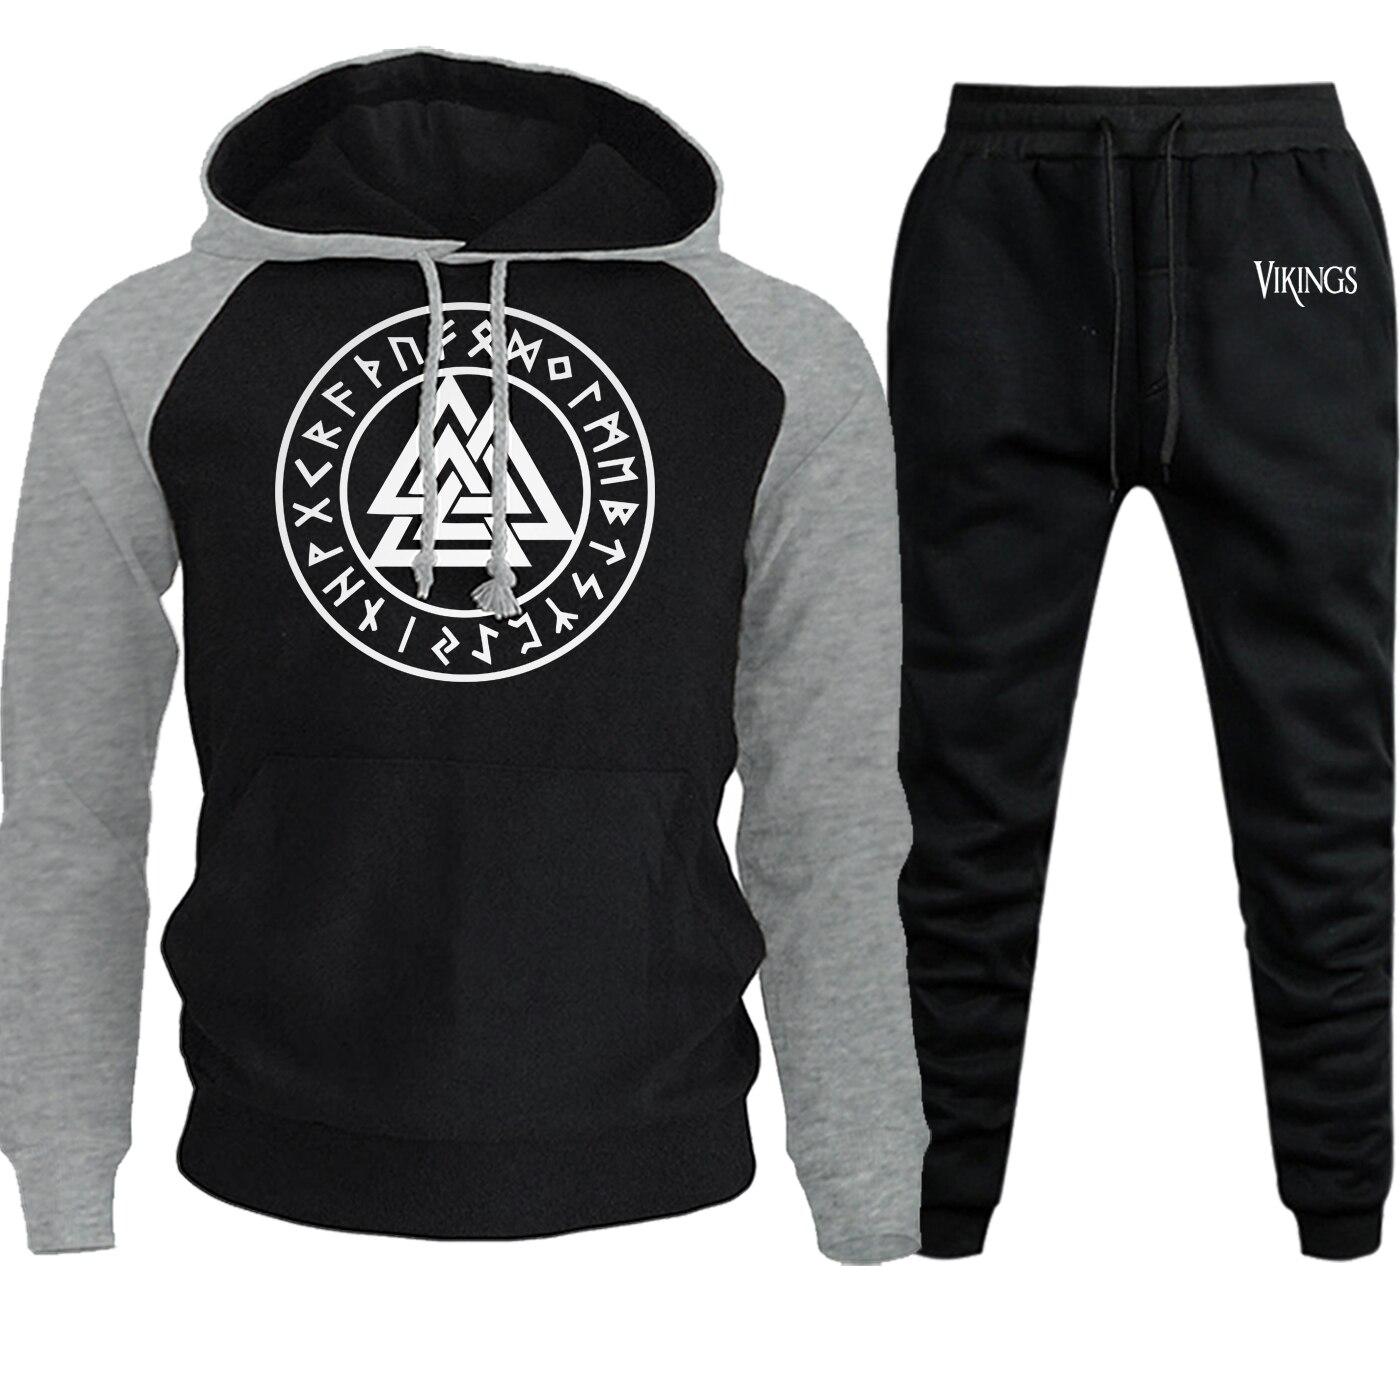 Sweatshirts Raglan Vikings Symbols Men Hooded Hot Sale Autumn Winter Casual Hoodies Suit Male Fleece Pullover+Pants 2 Piece Set